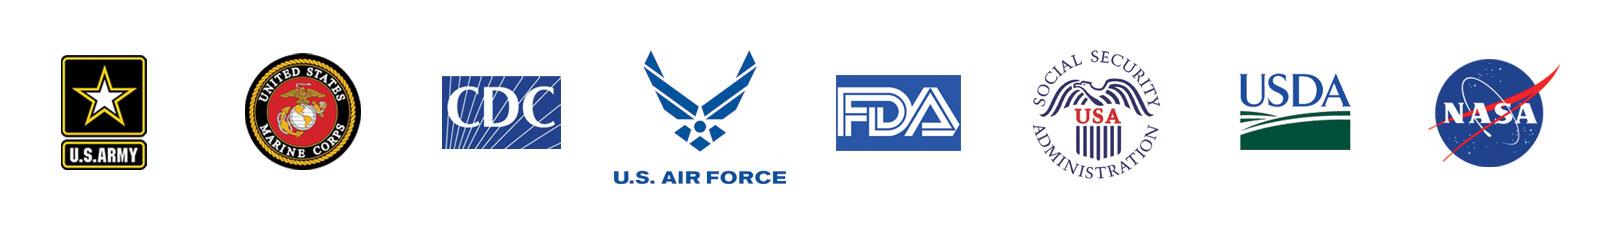 gov-logos